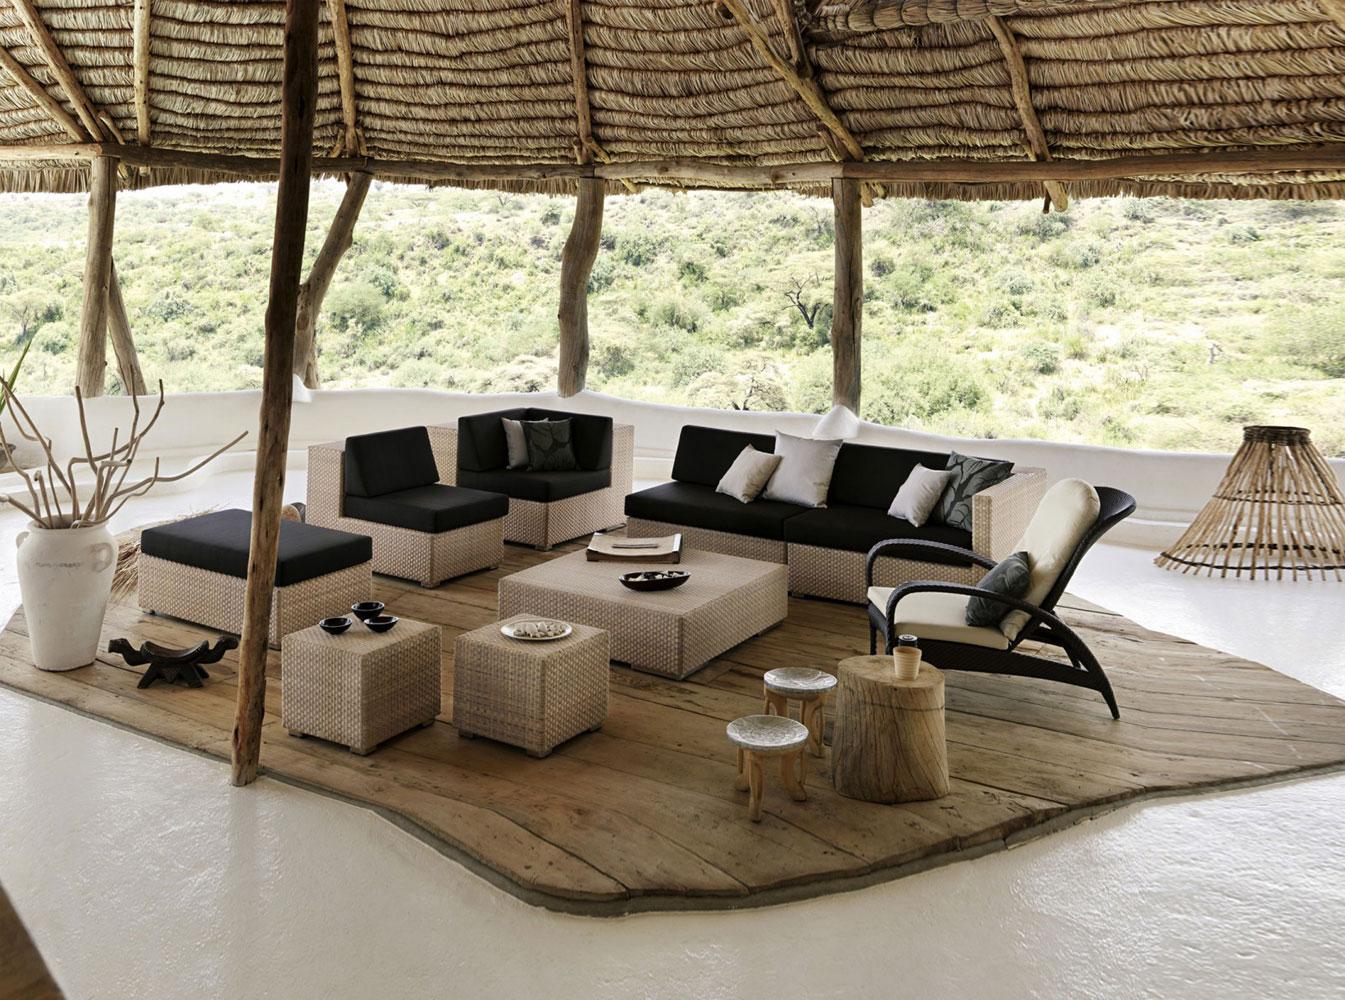 Estar Lounge de Dedon